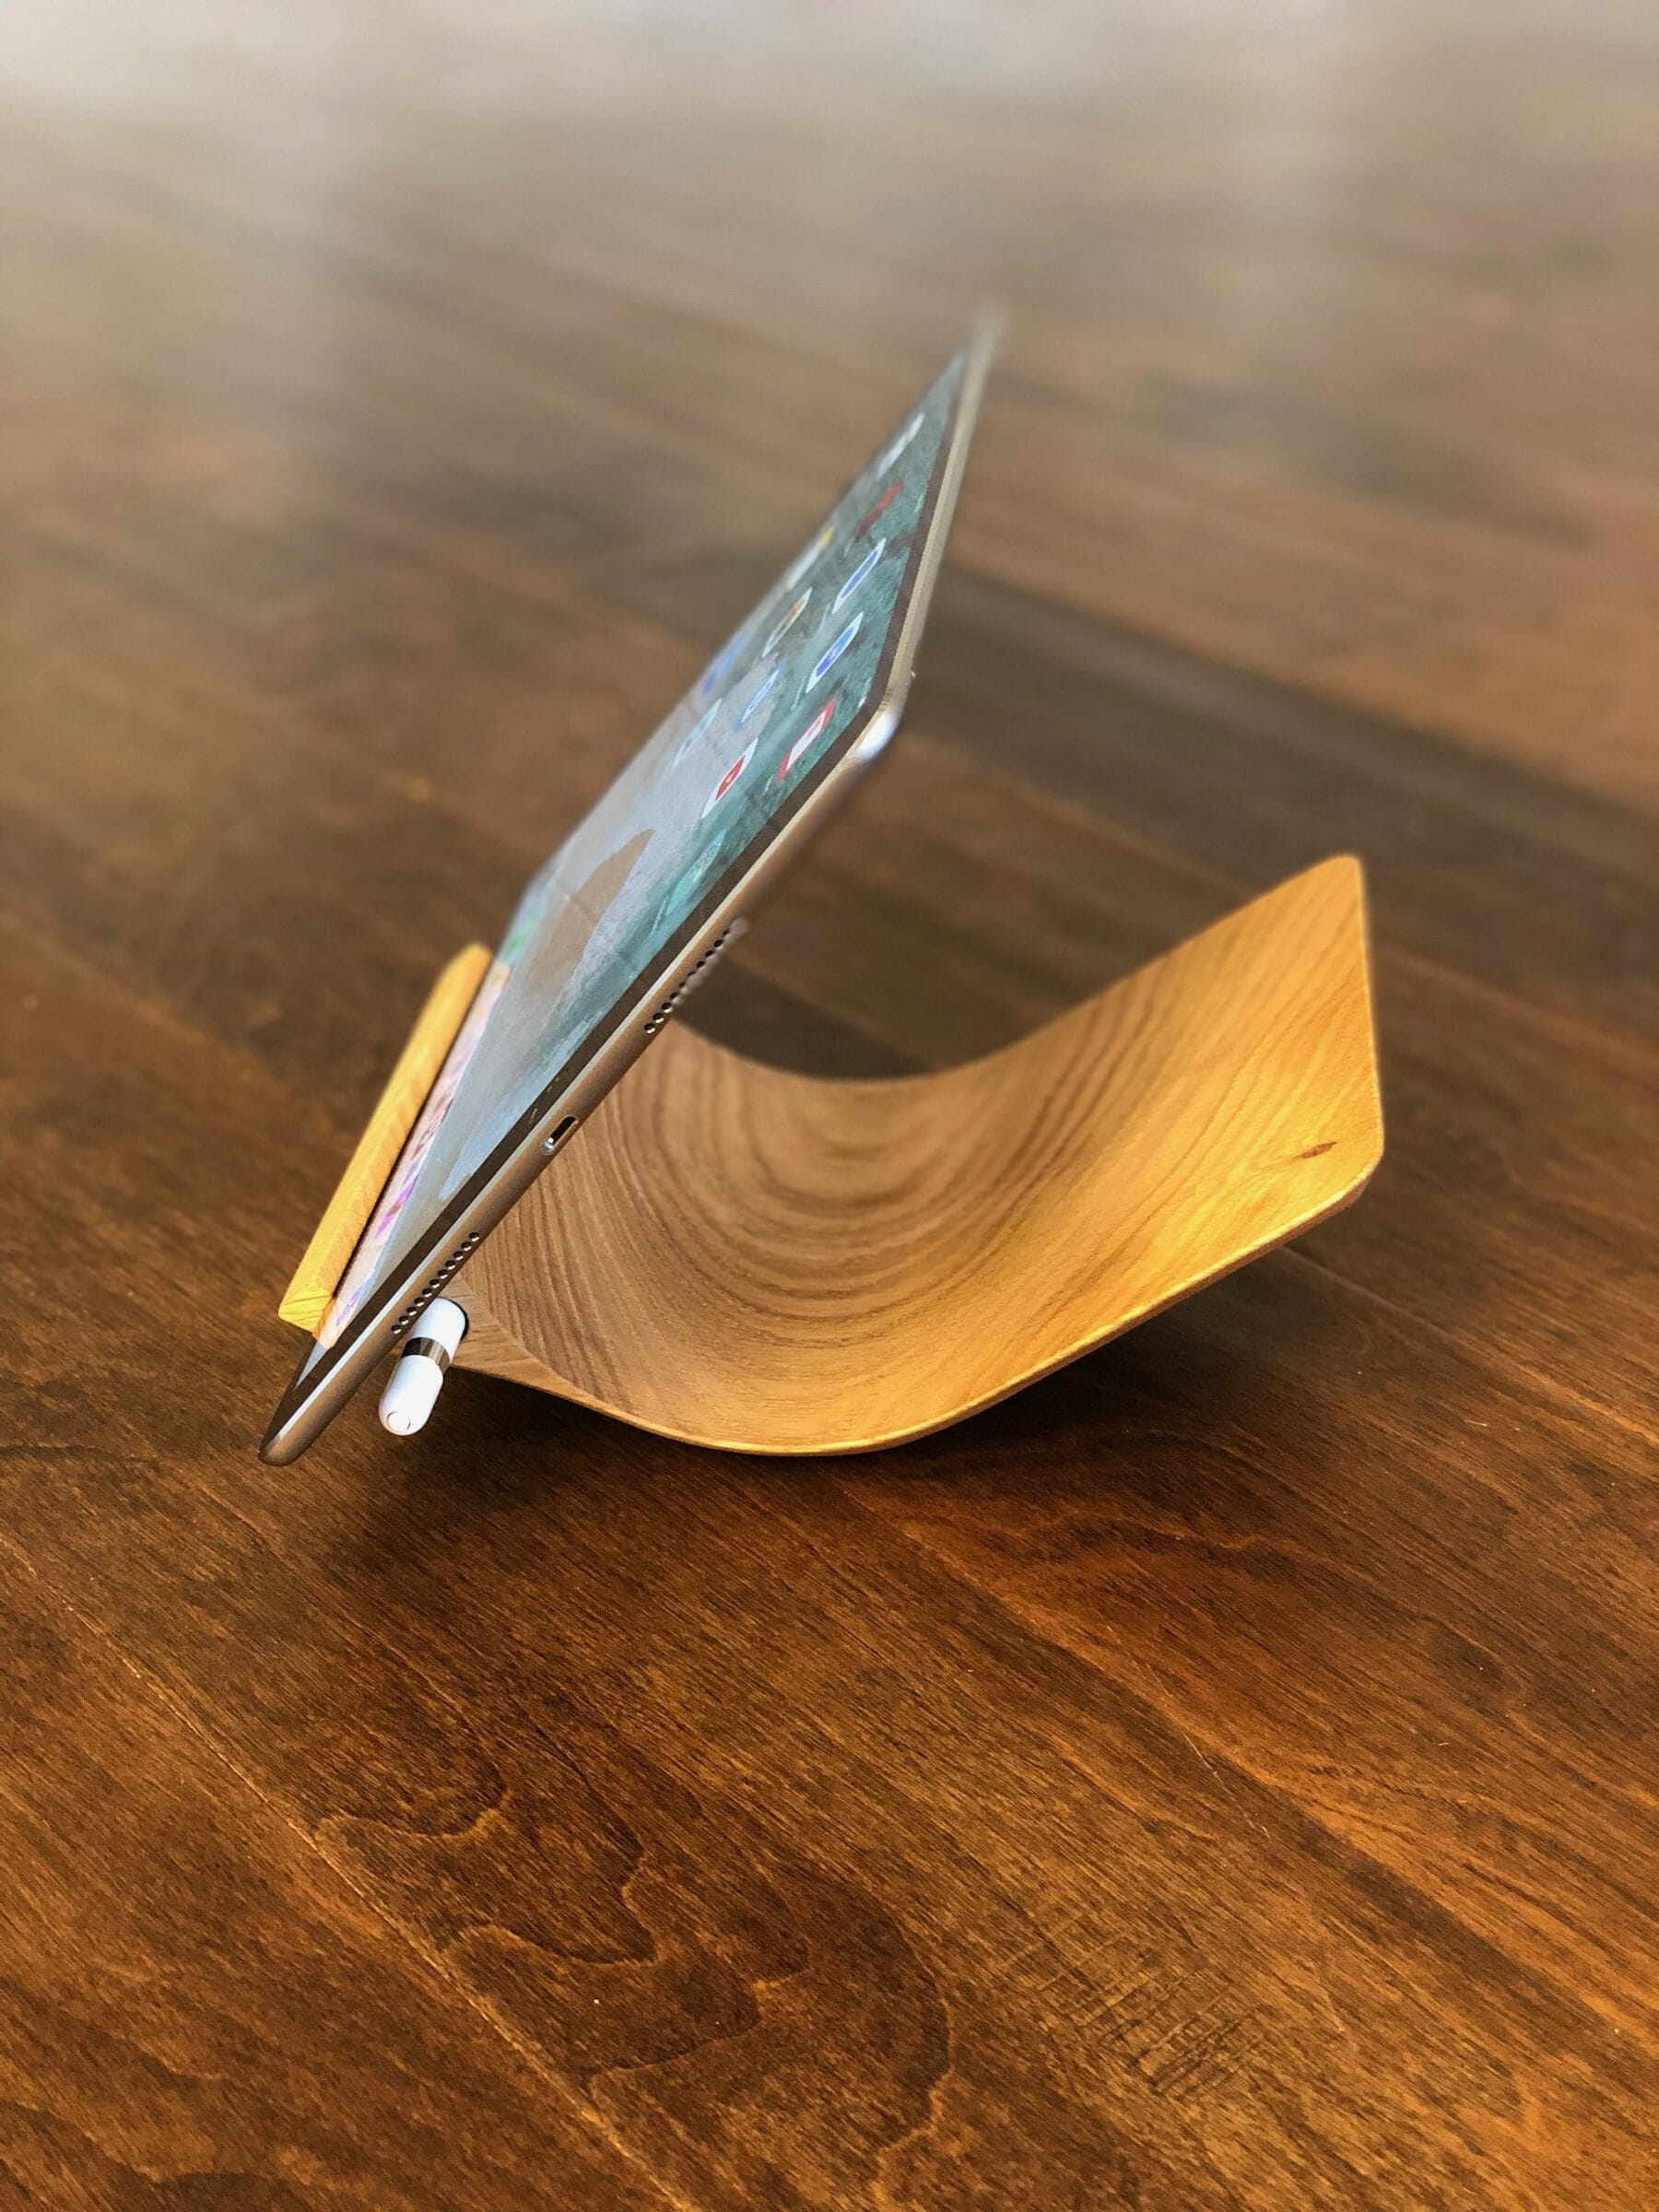 Yohann iPad Stand with iPad Pro